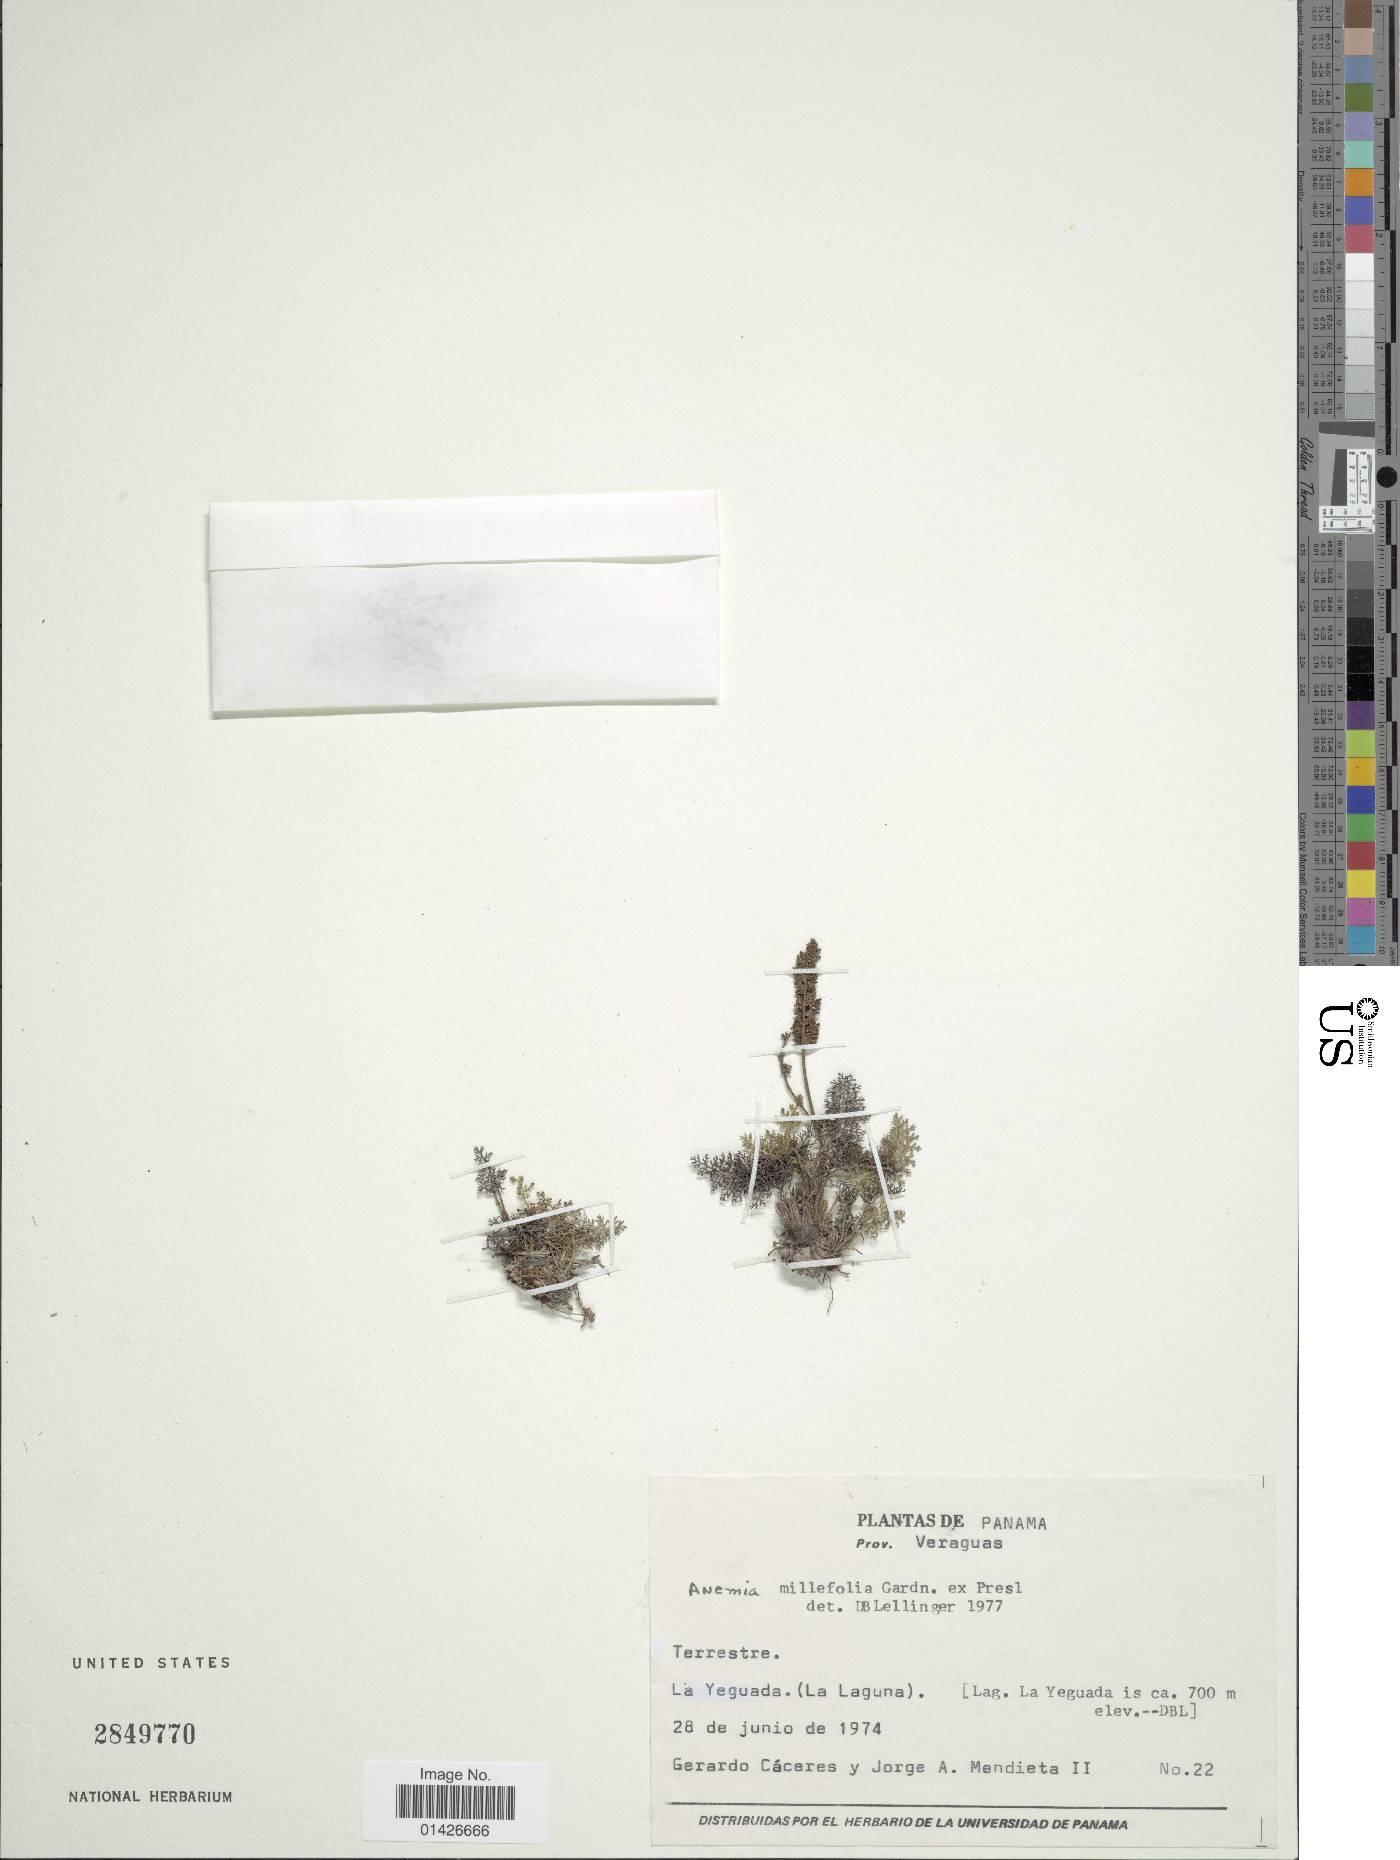 Anemia millefolia image